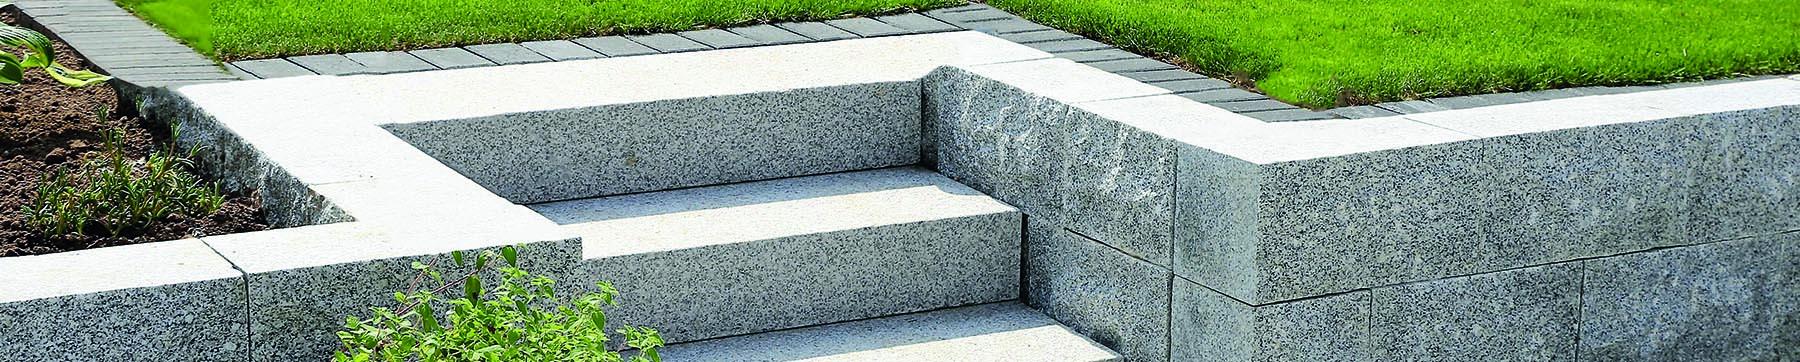 granit schody.jpg